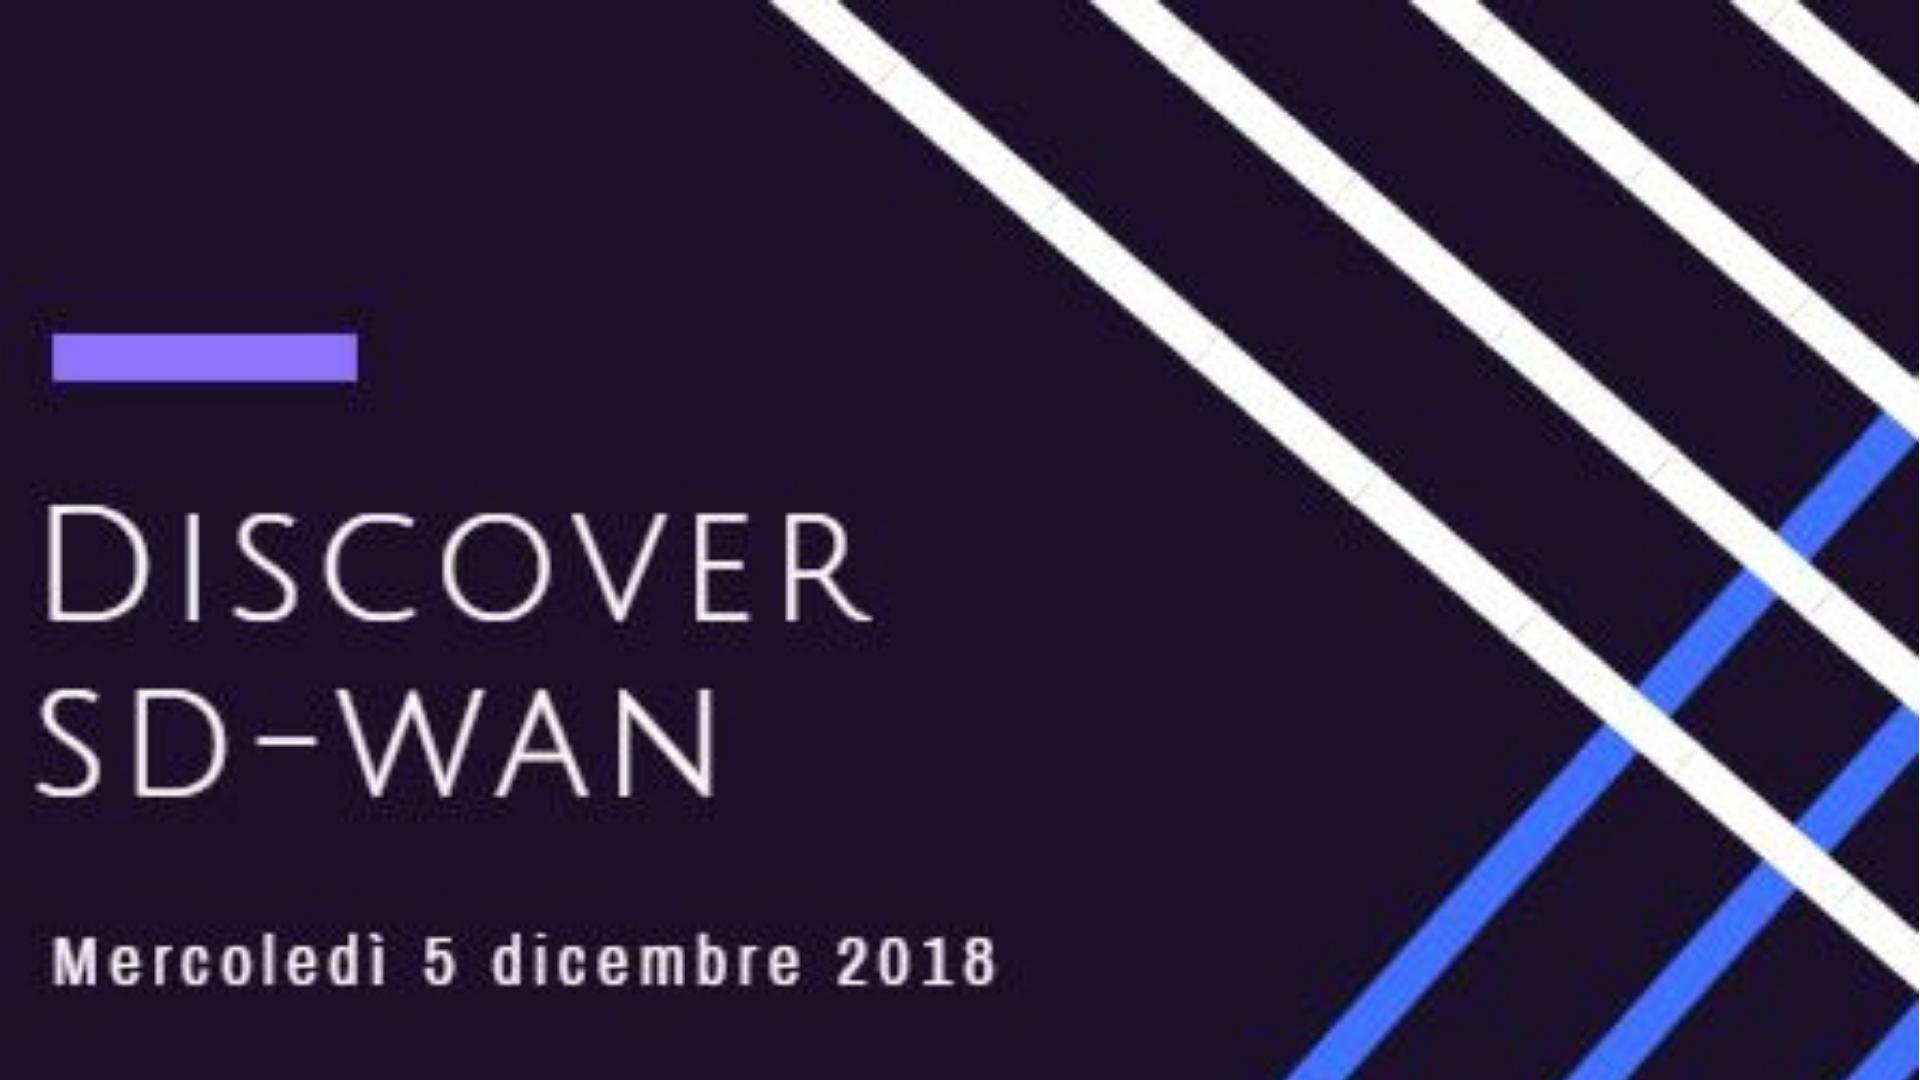 Partecipa al webinar dedicato a SD-WAN!